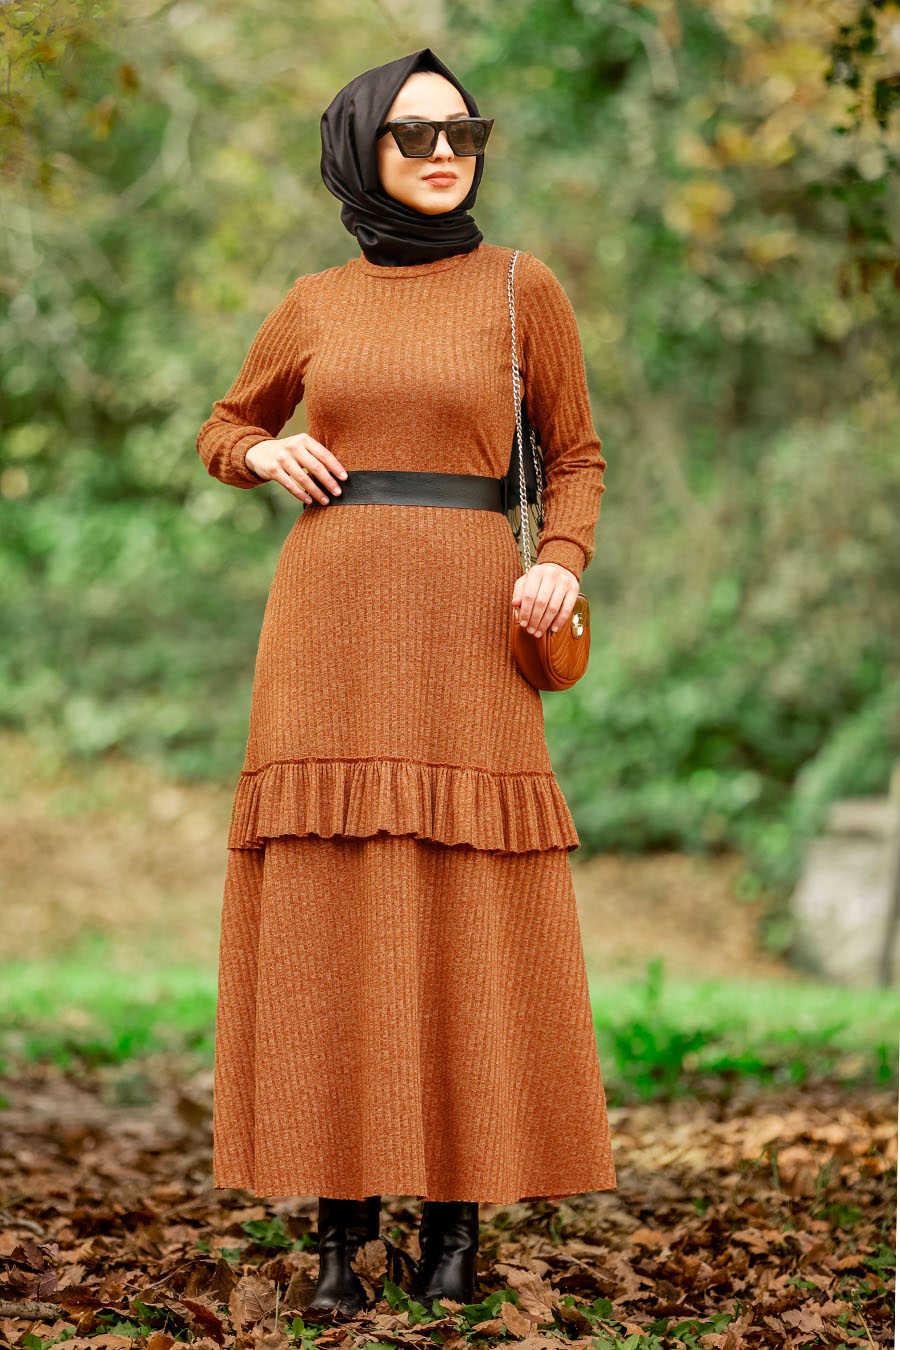 Neva Style - Snuff Colored Hijab Dress 4021TB